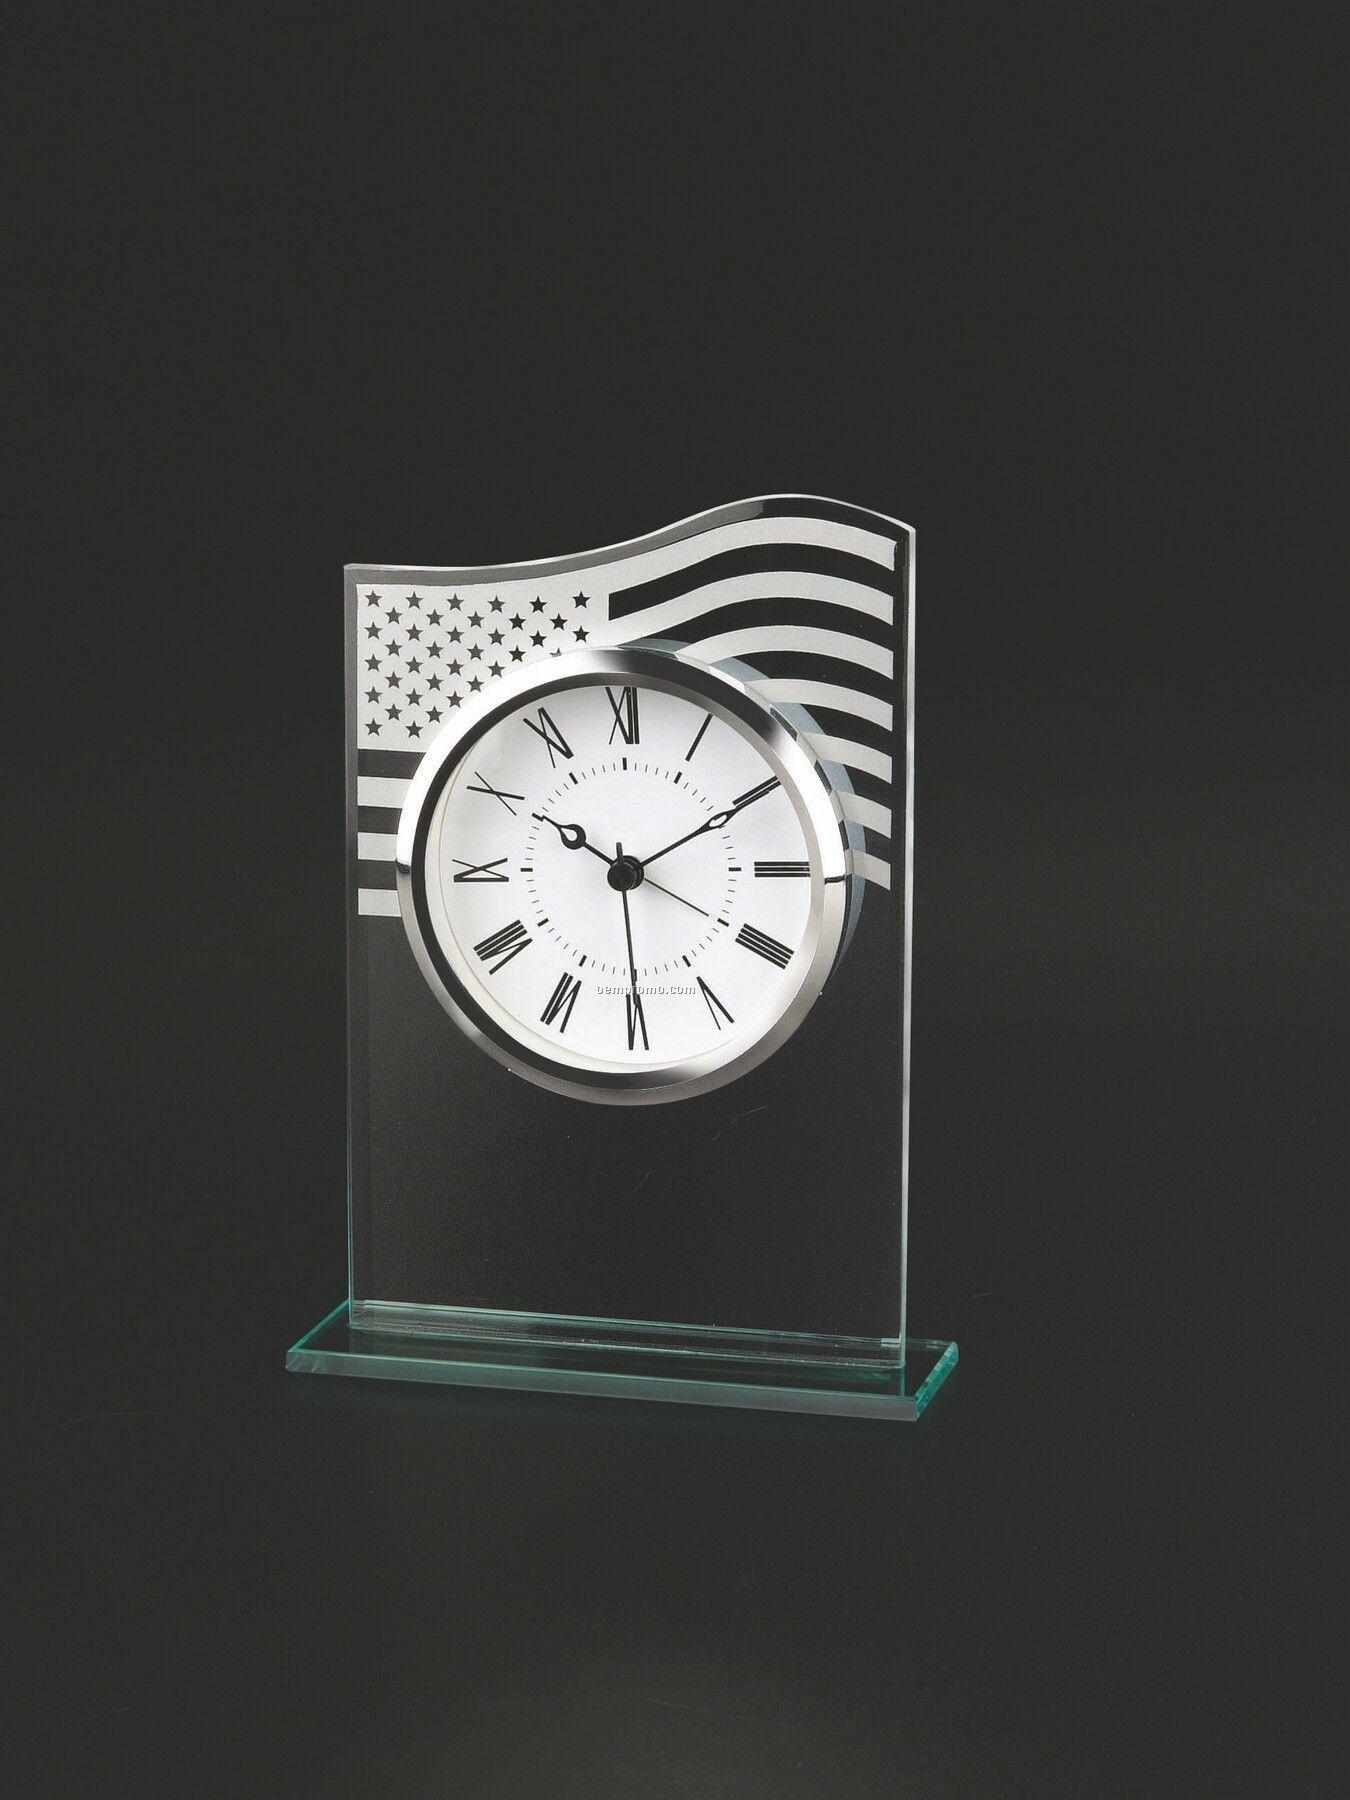 U.s. Flag Glass Alarm Clock